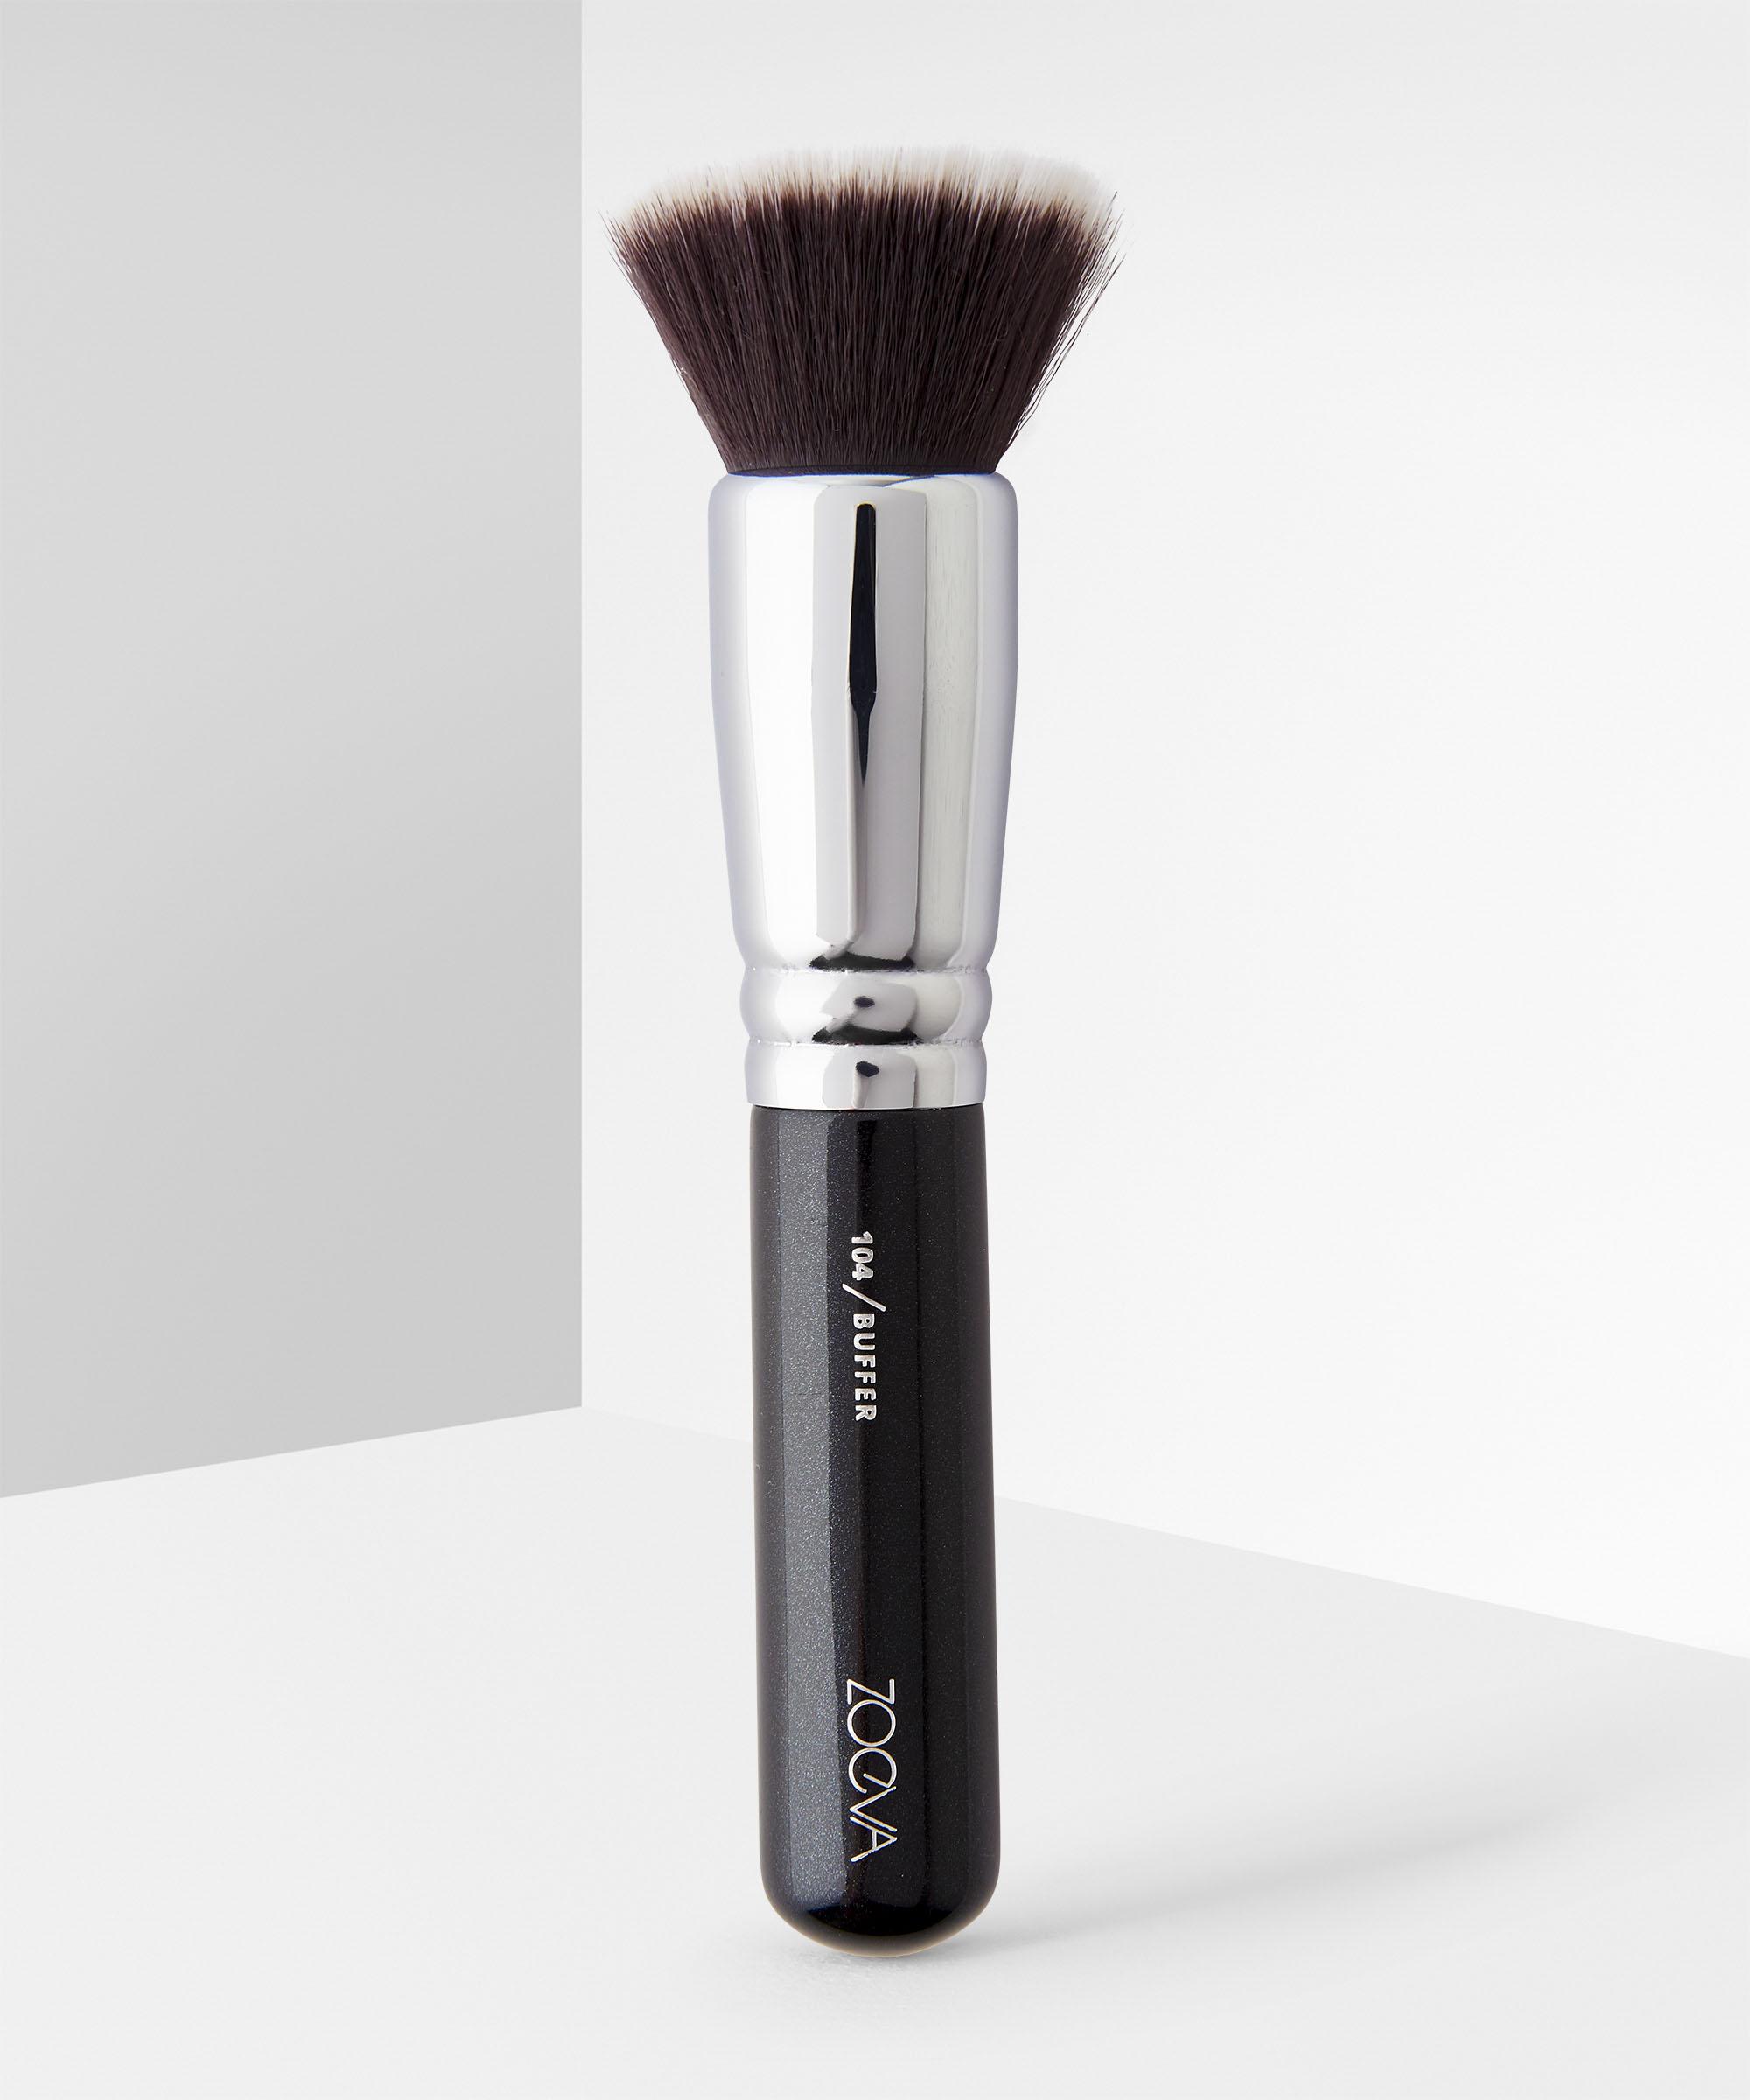 Zoeva 104 Buffer Brush At Beauty Bay